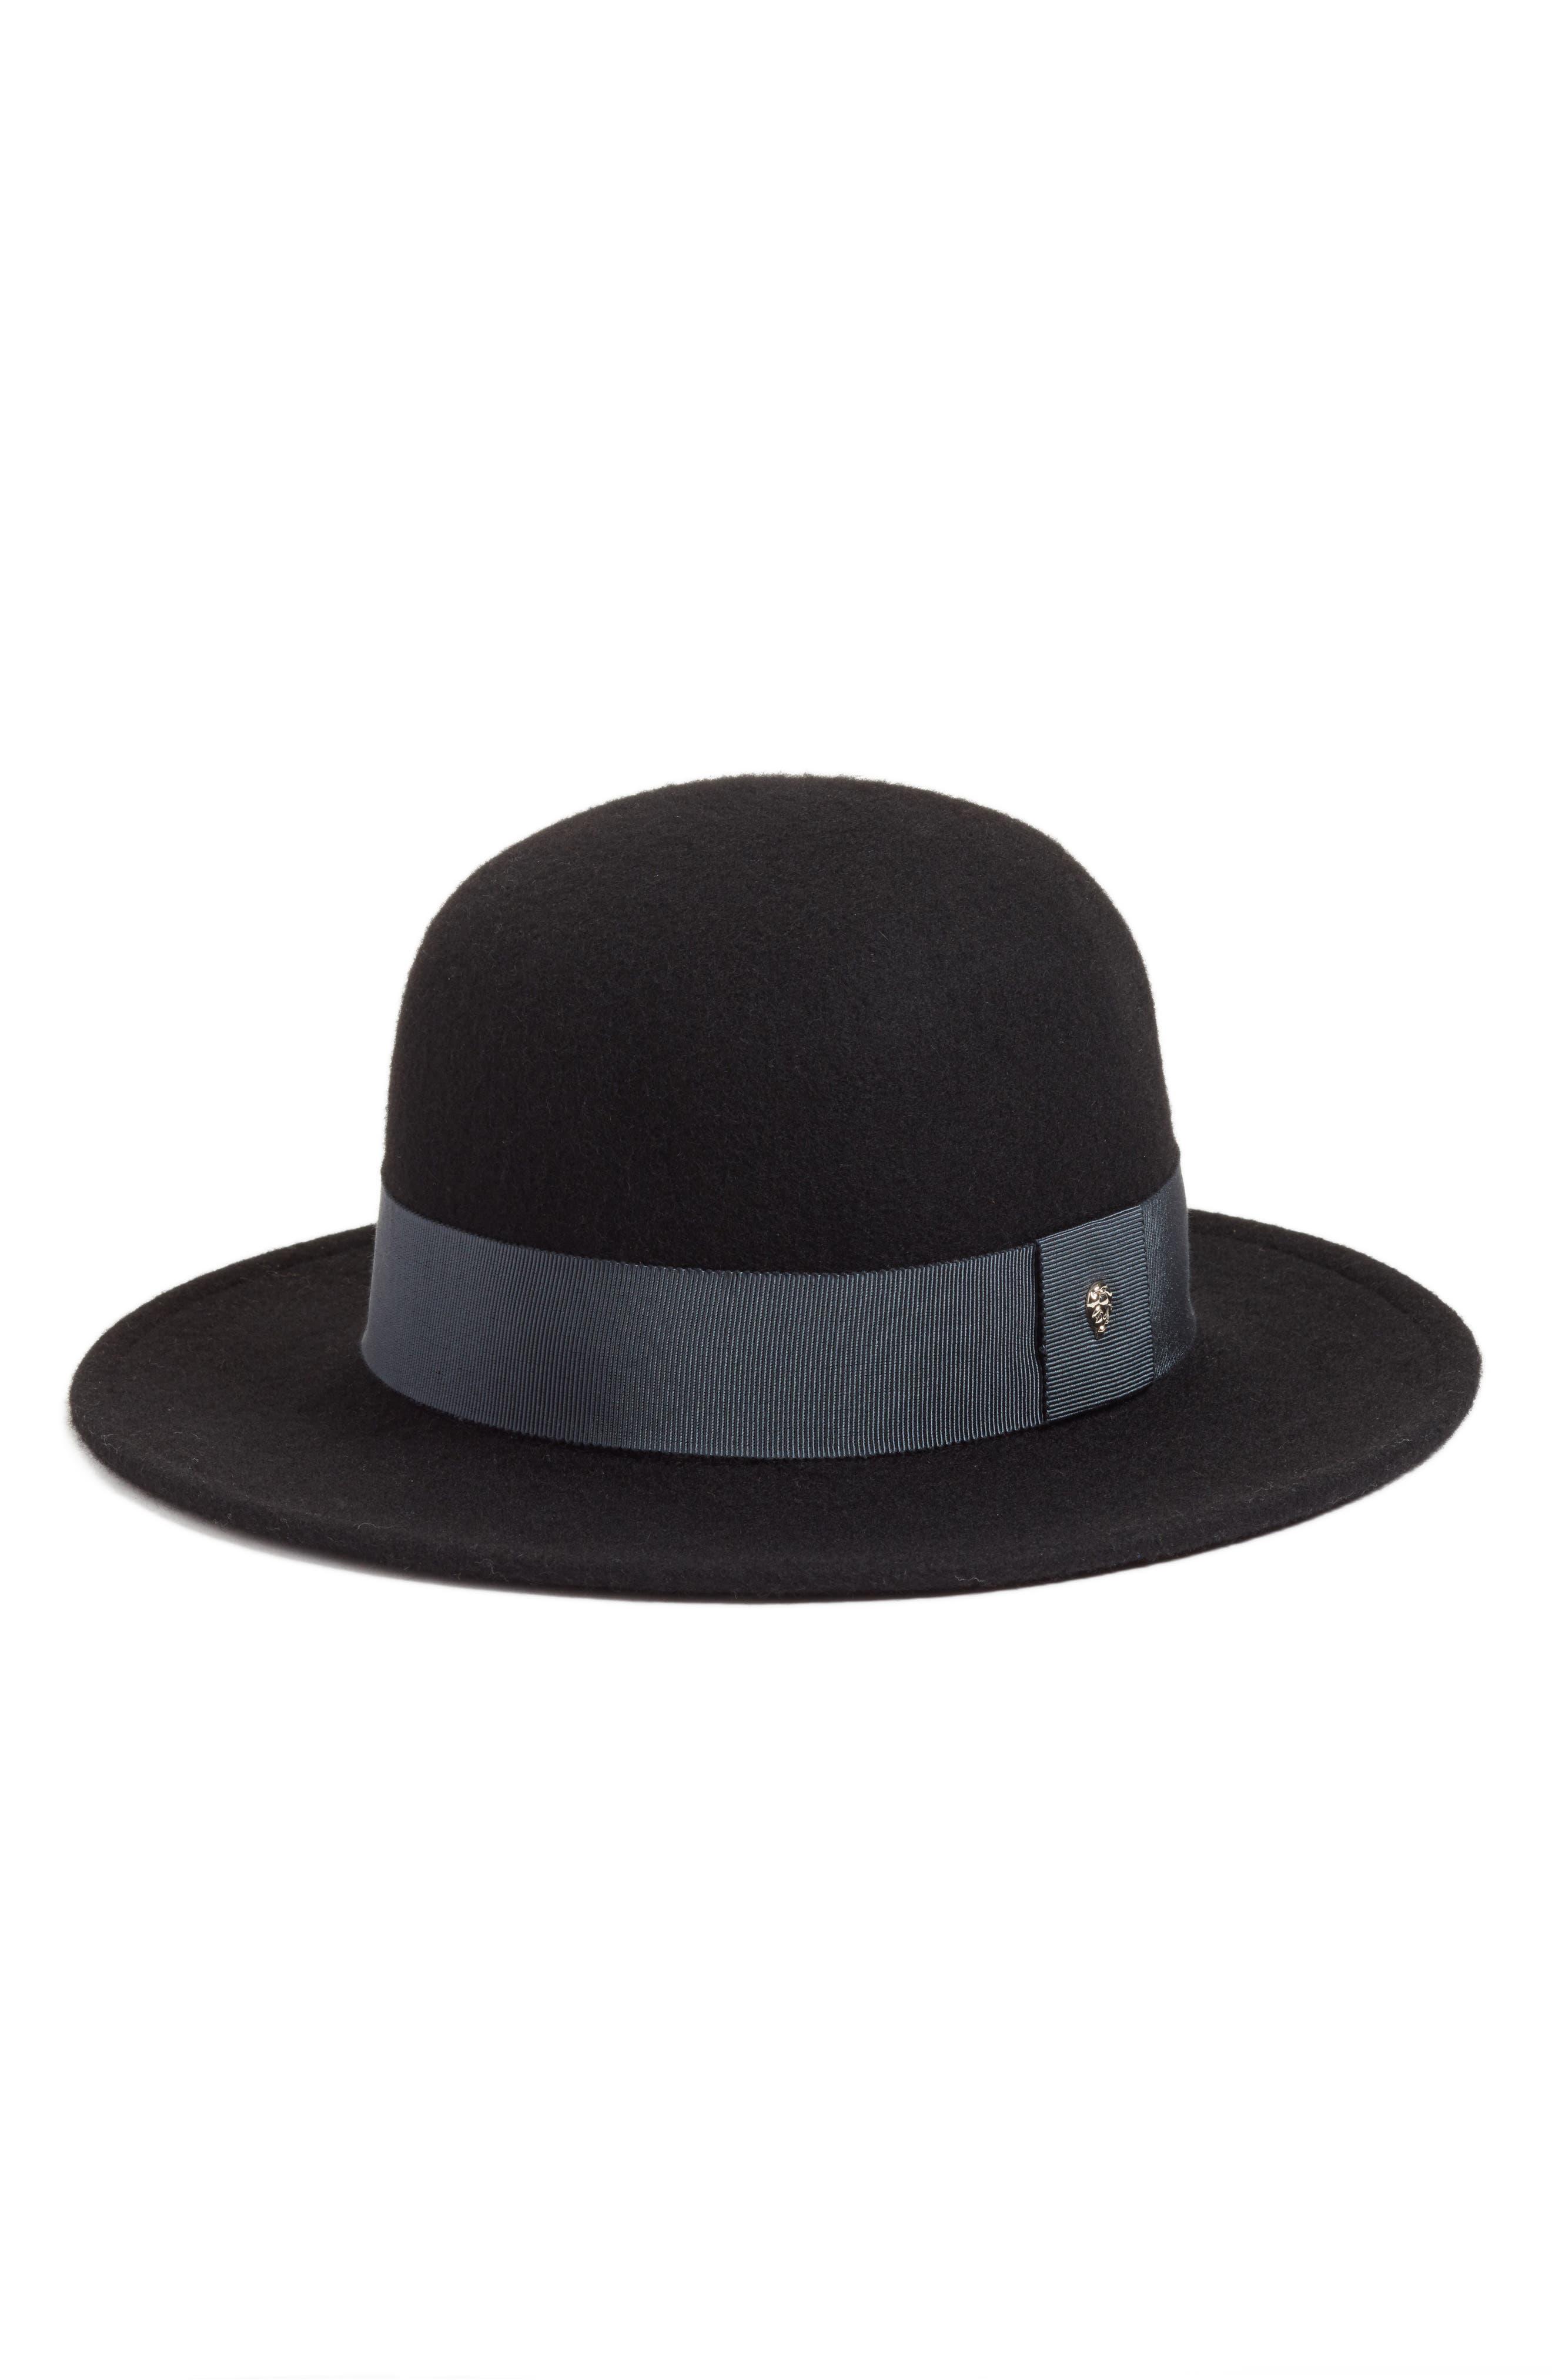 Wool Felt Round Hat,                             Main thumbnail 1, color,                             008